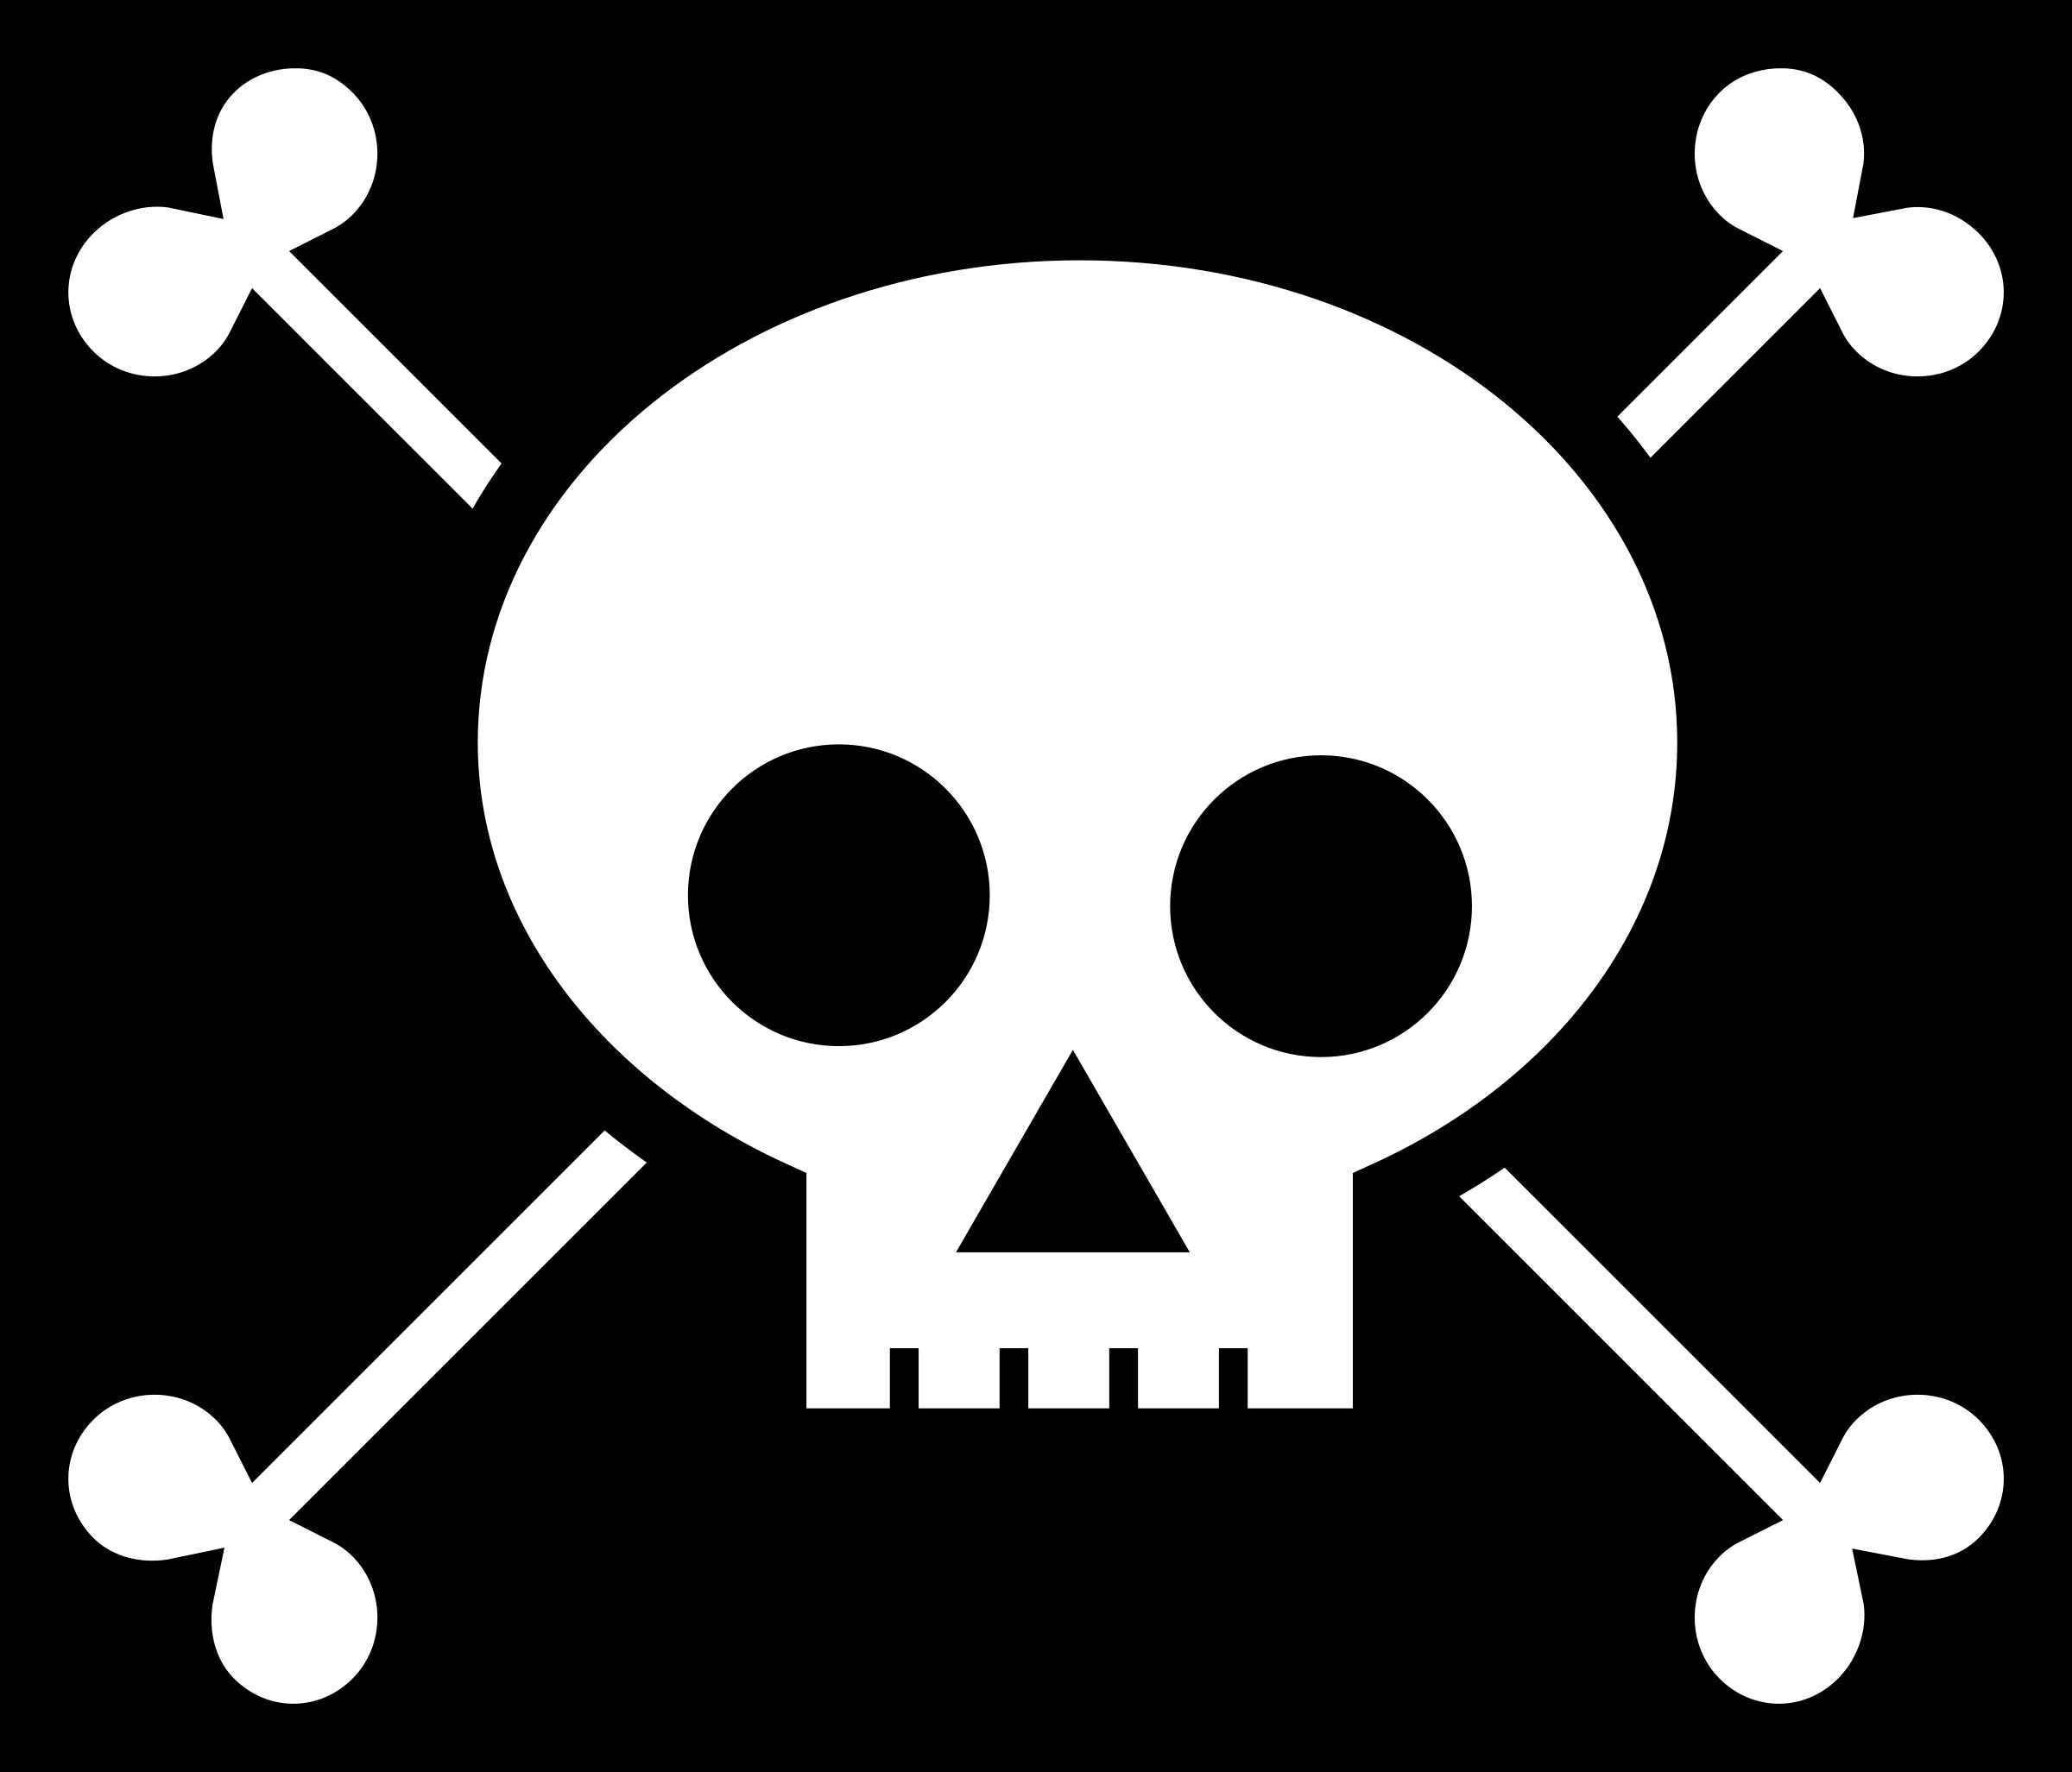 Skeleton clipart simple, Skeleton simple Transparent FREE.